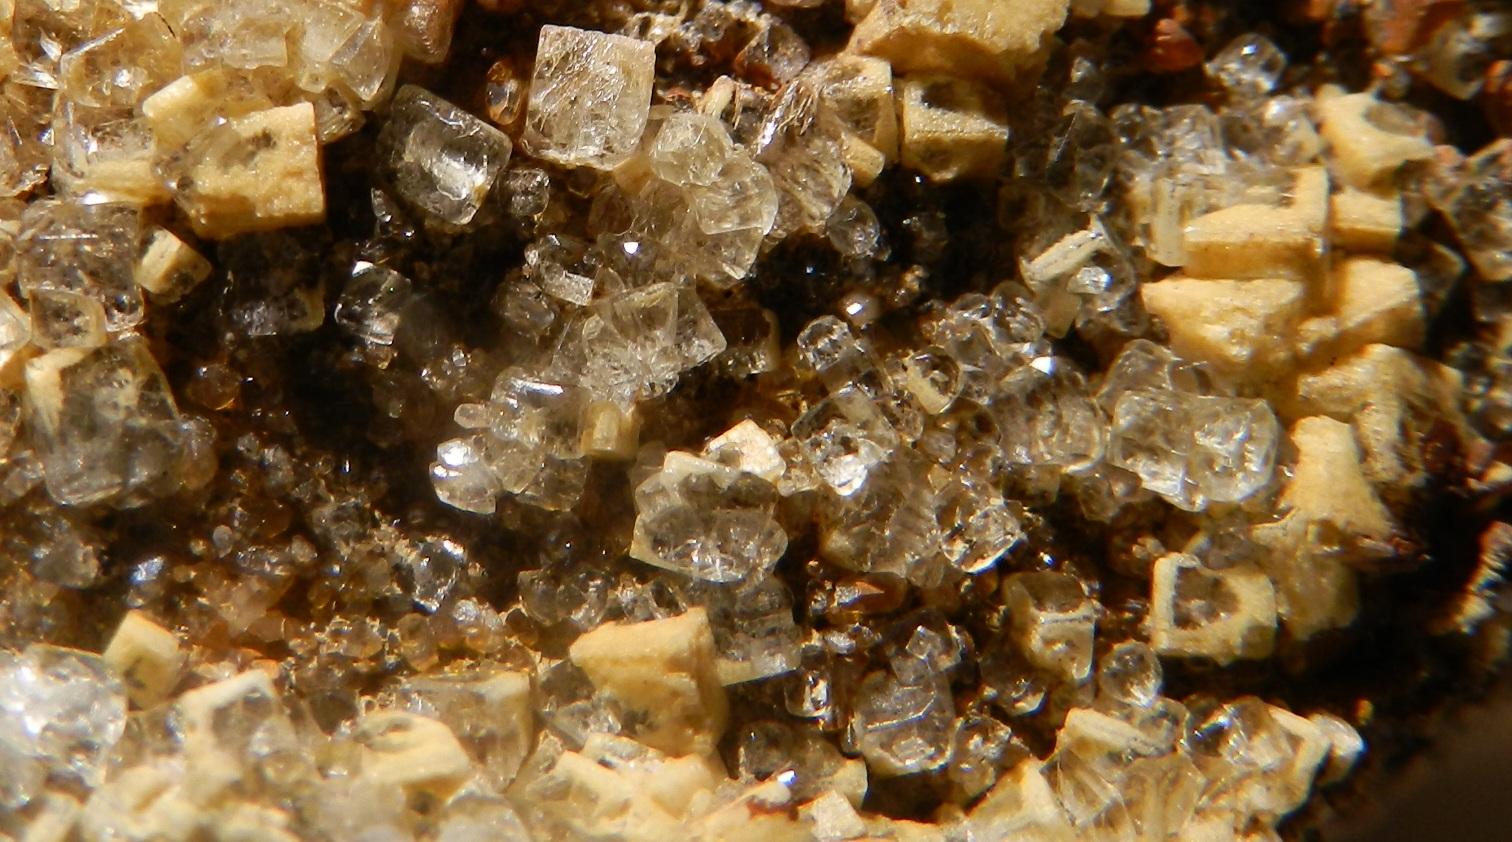 Fluorine du Bois du Roptai (Ave et Auffe) Detail1